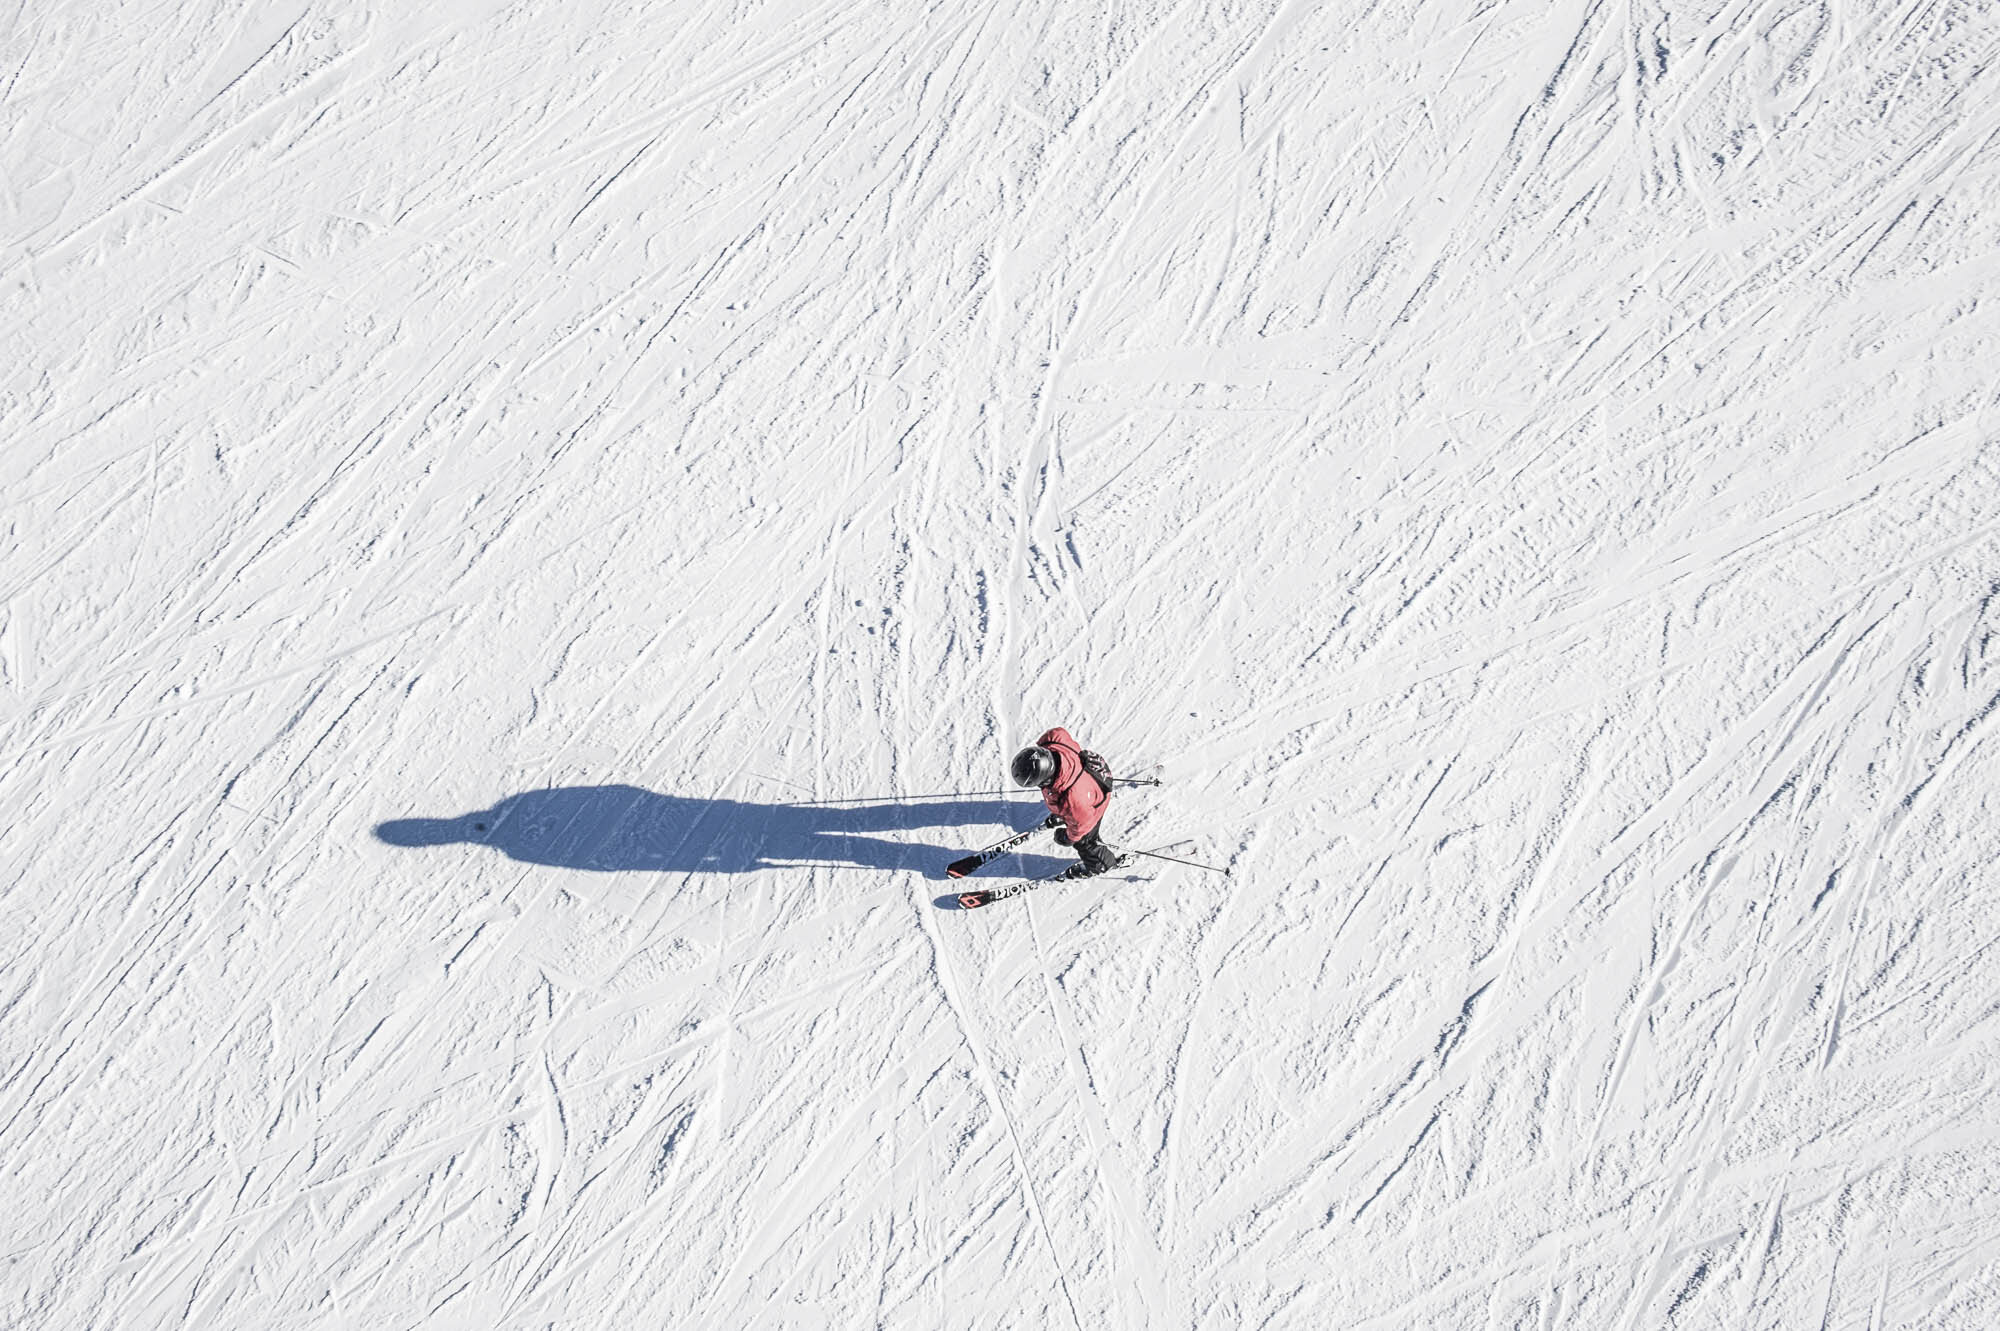 tgski-chalet-holidays-staff-lifestyle010.jpg